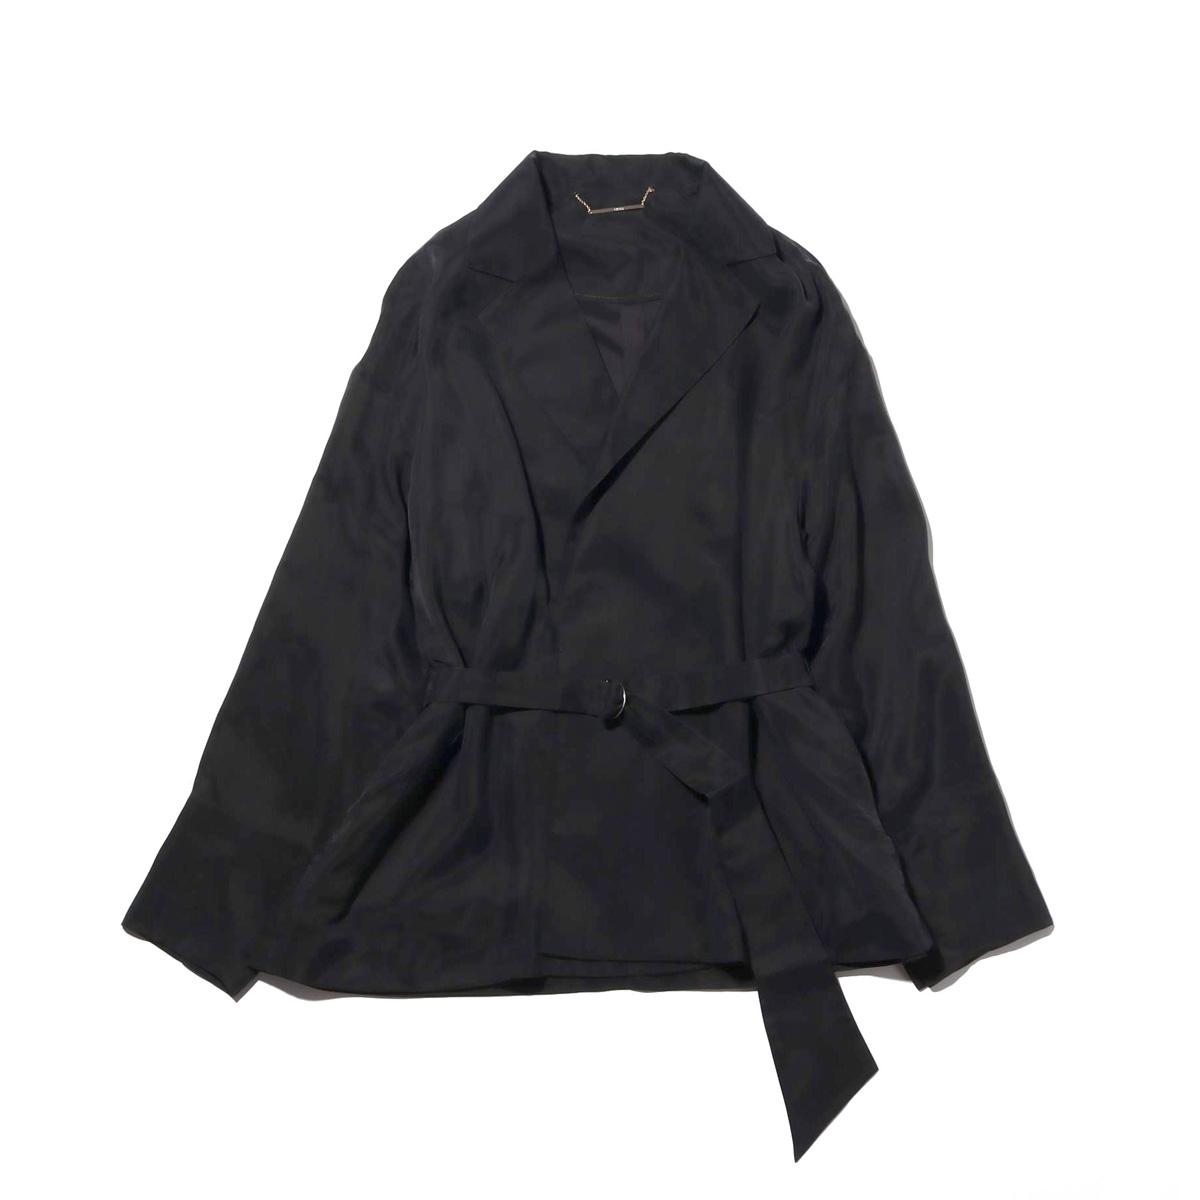 atmos pink ベルト付き ジャケット (アトモスピンク ベルトツキ ジャケット)BLACK【レディース ジャケット】18FA-I